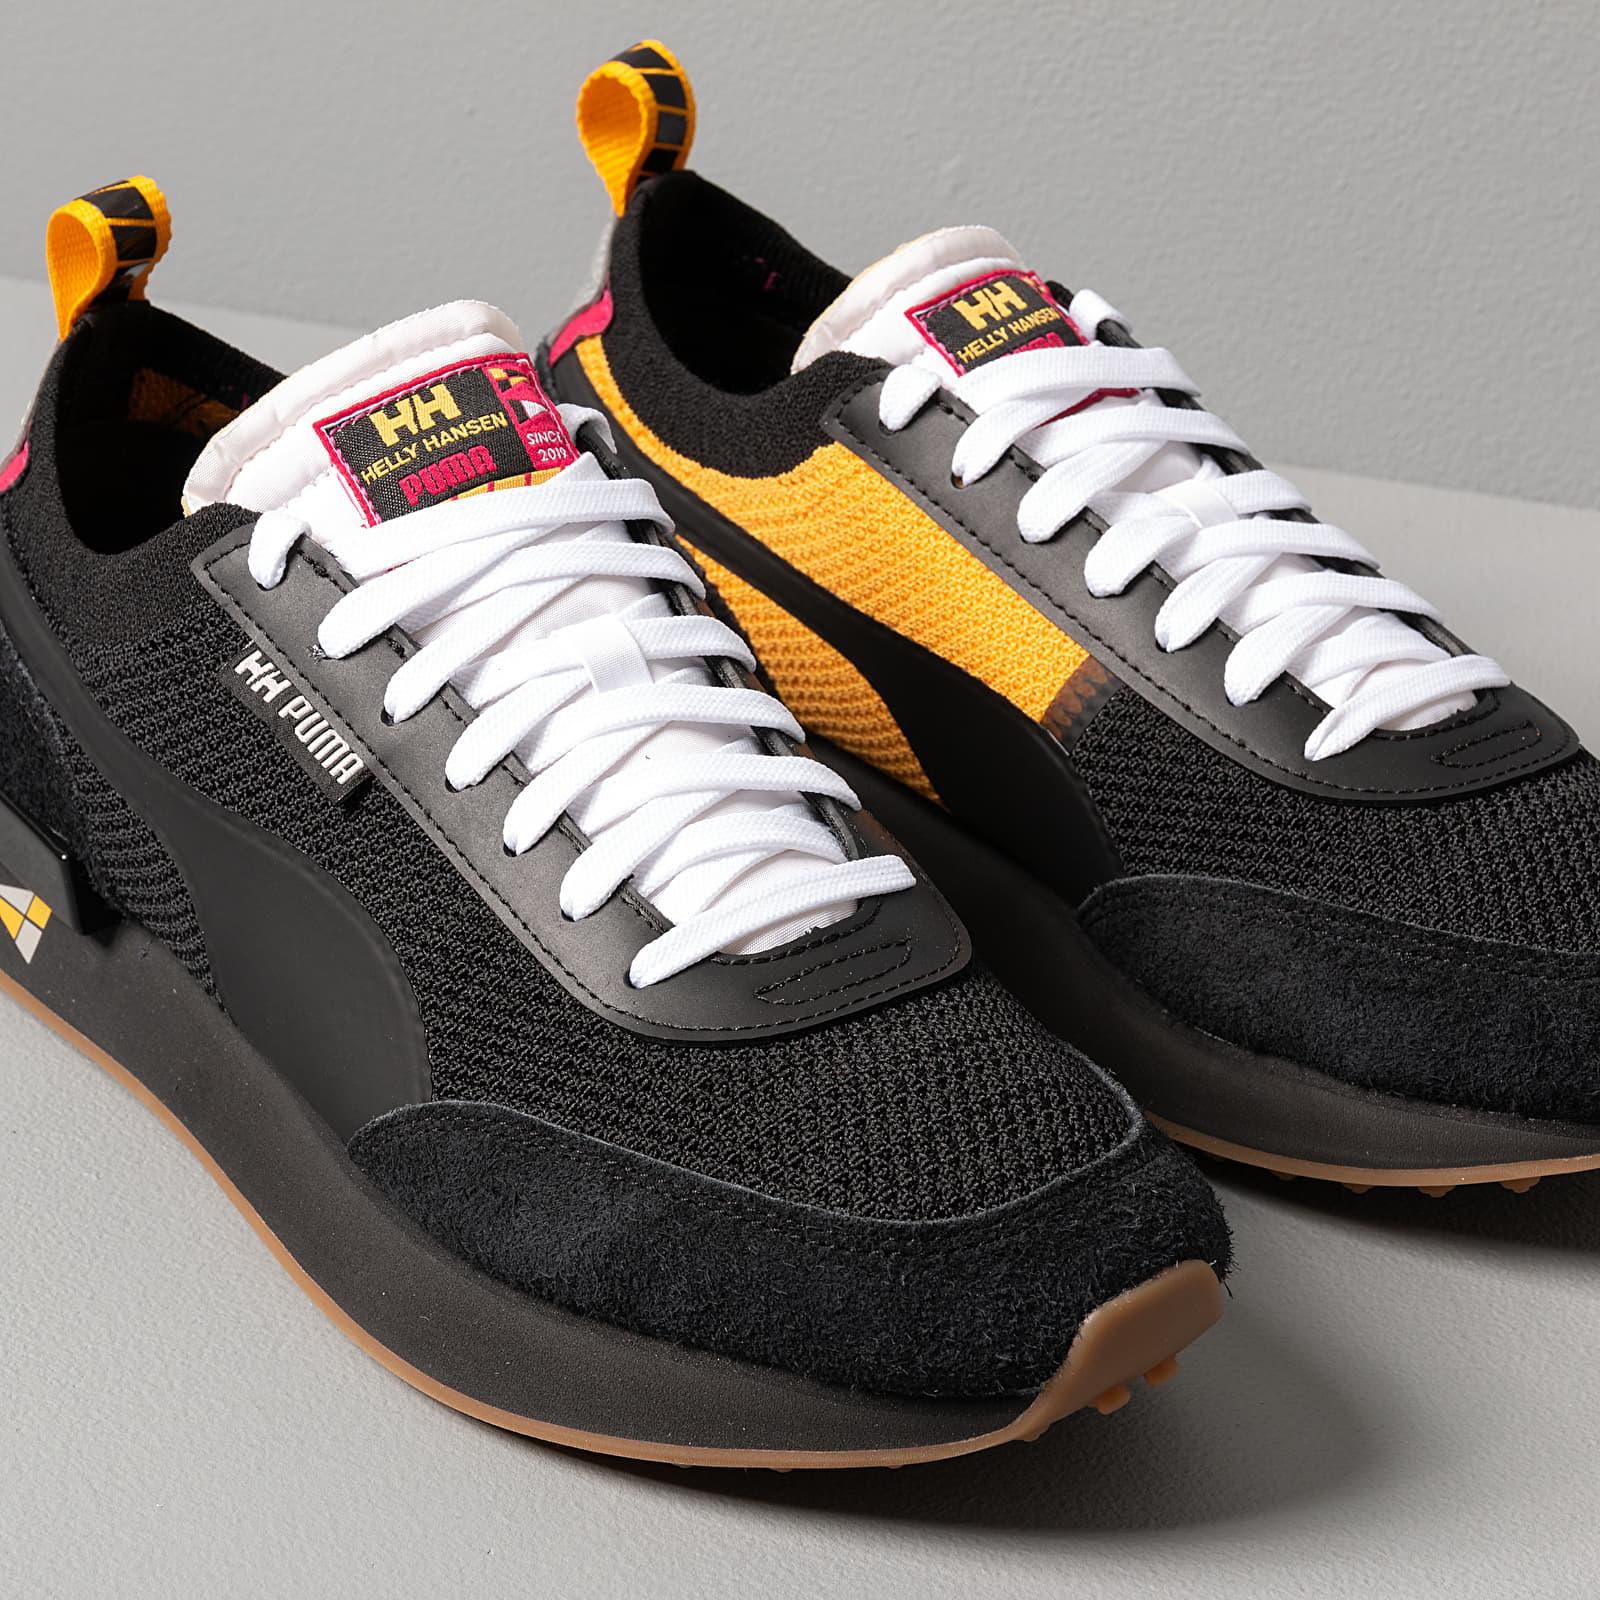 Buty męskie sneakersy Puma x Helly Hansen Future Rider